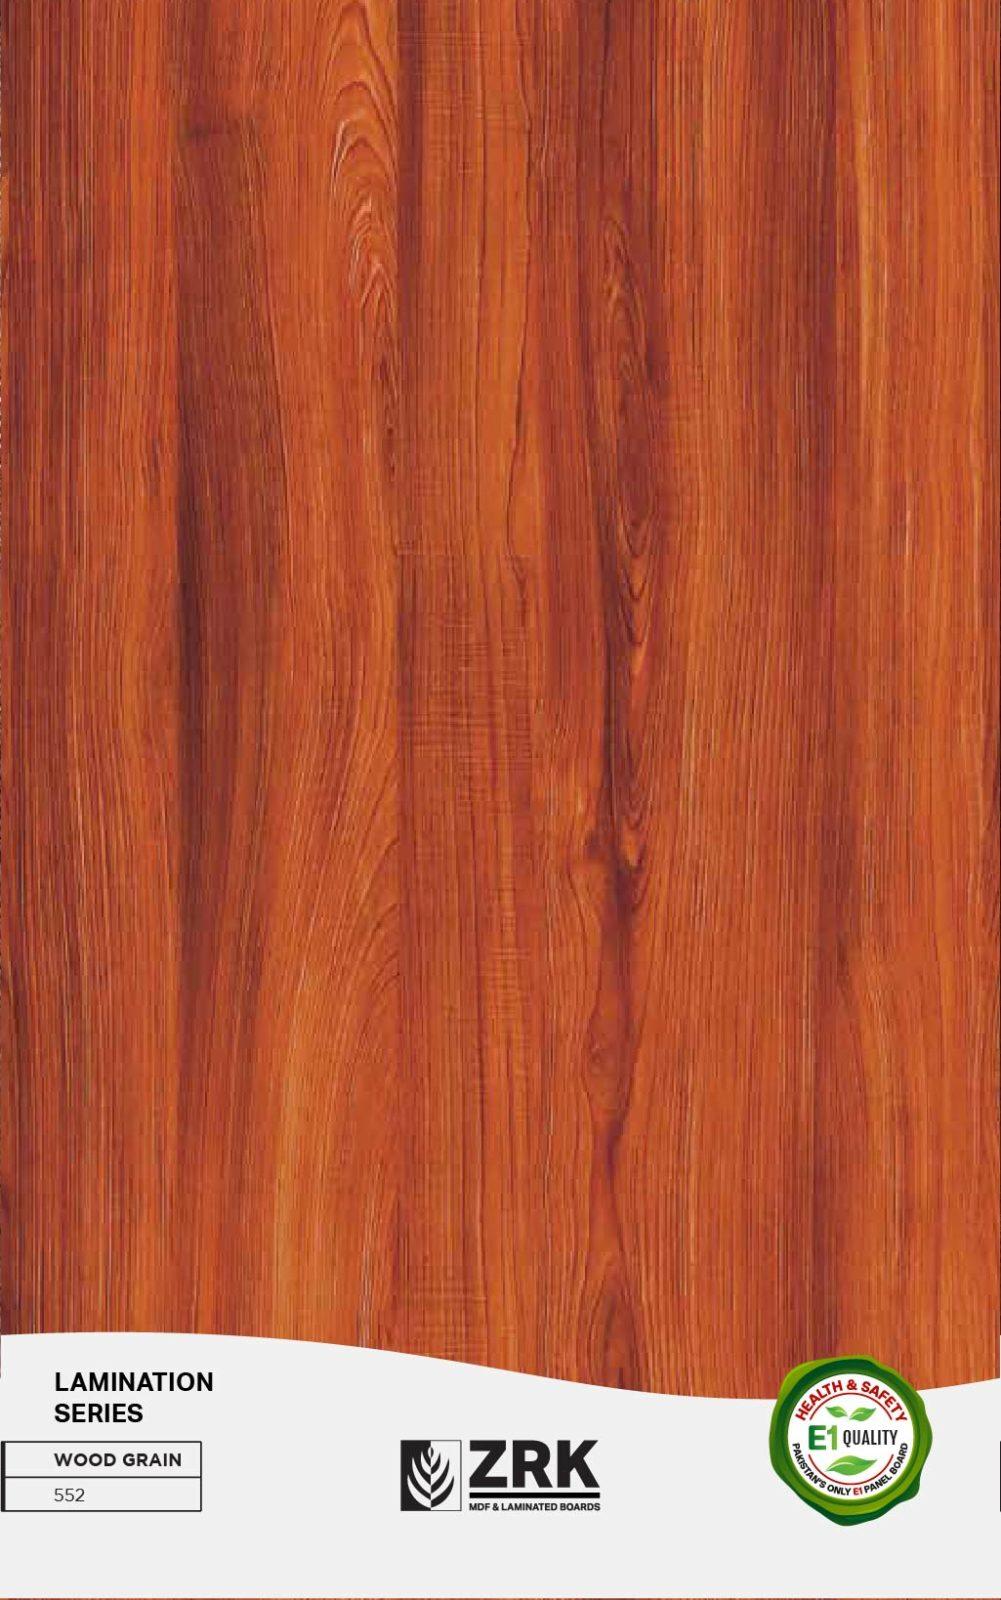 Lamination - Wood Grain - 552